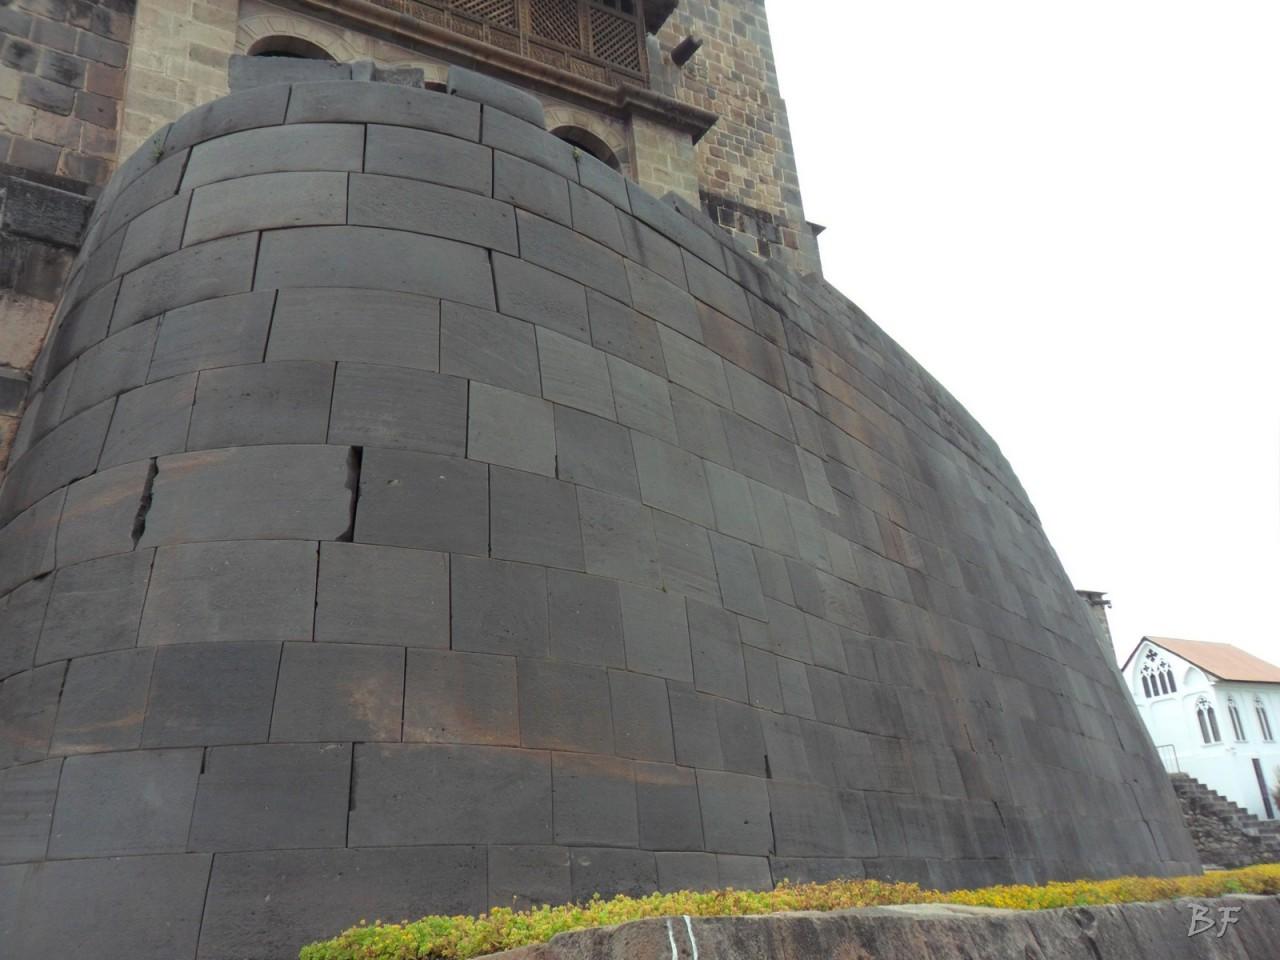 Mura-Poligonali-Megaliti-Tempio-Coricancha-Cusco-Perù-8